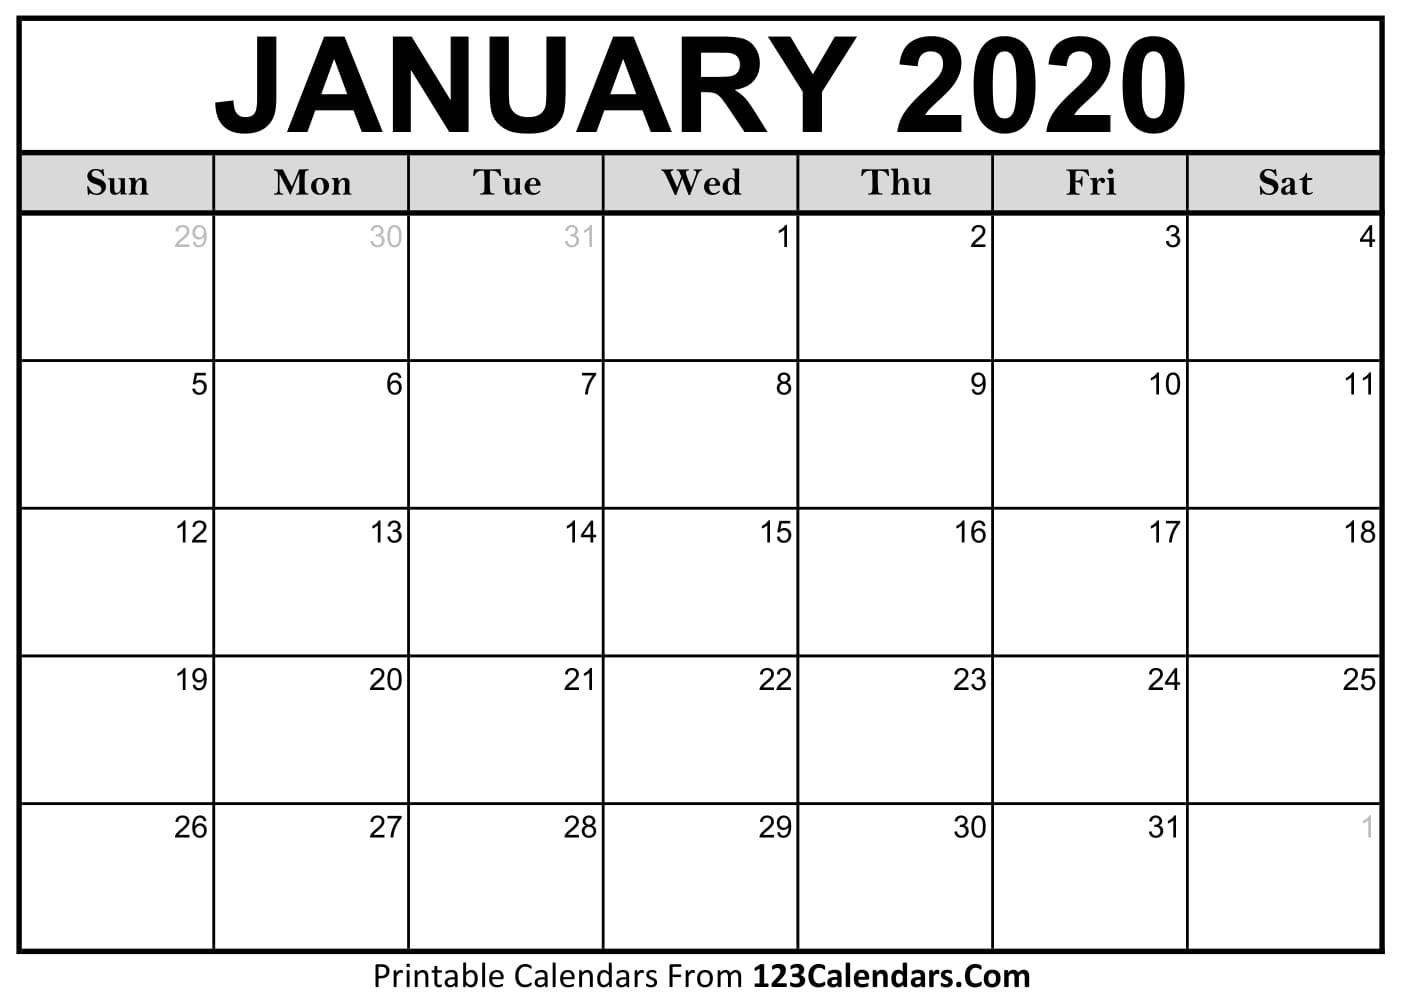 January 2020 Printable Calendar | 123Calendars-January 2020 Calendar Of Events